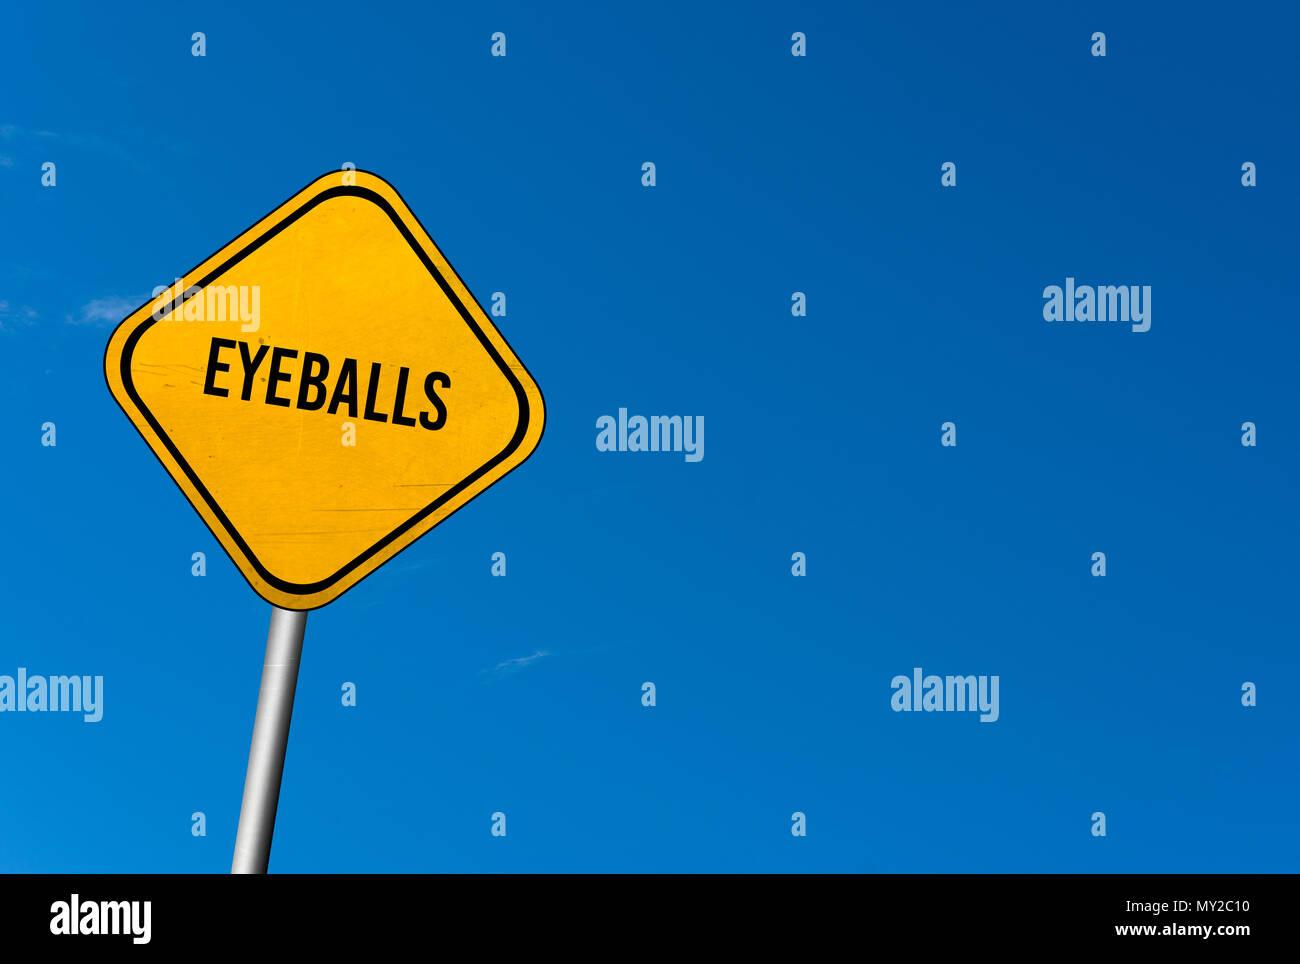 Eyeballs - yellow sign with blue sky - Stock Image